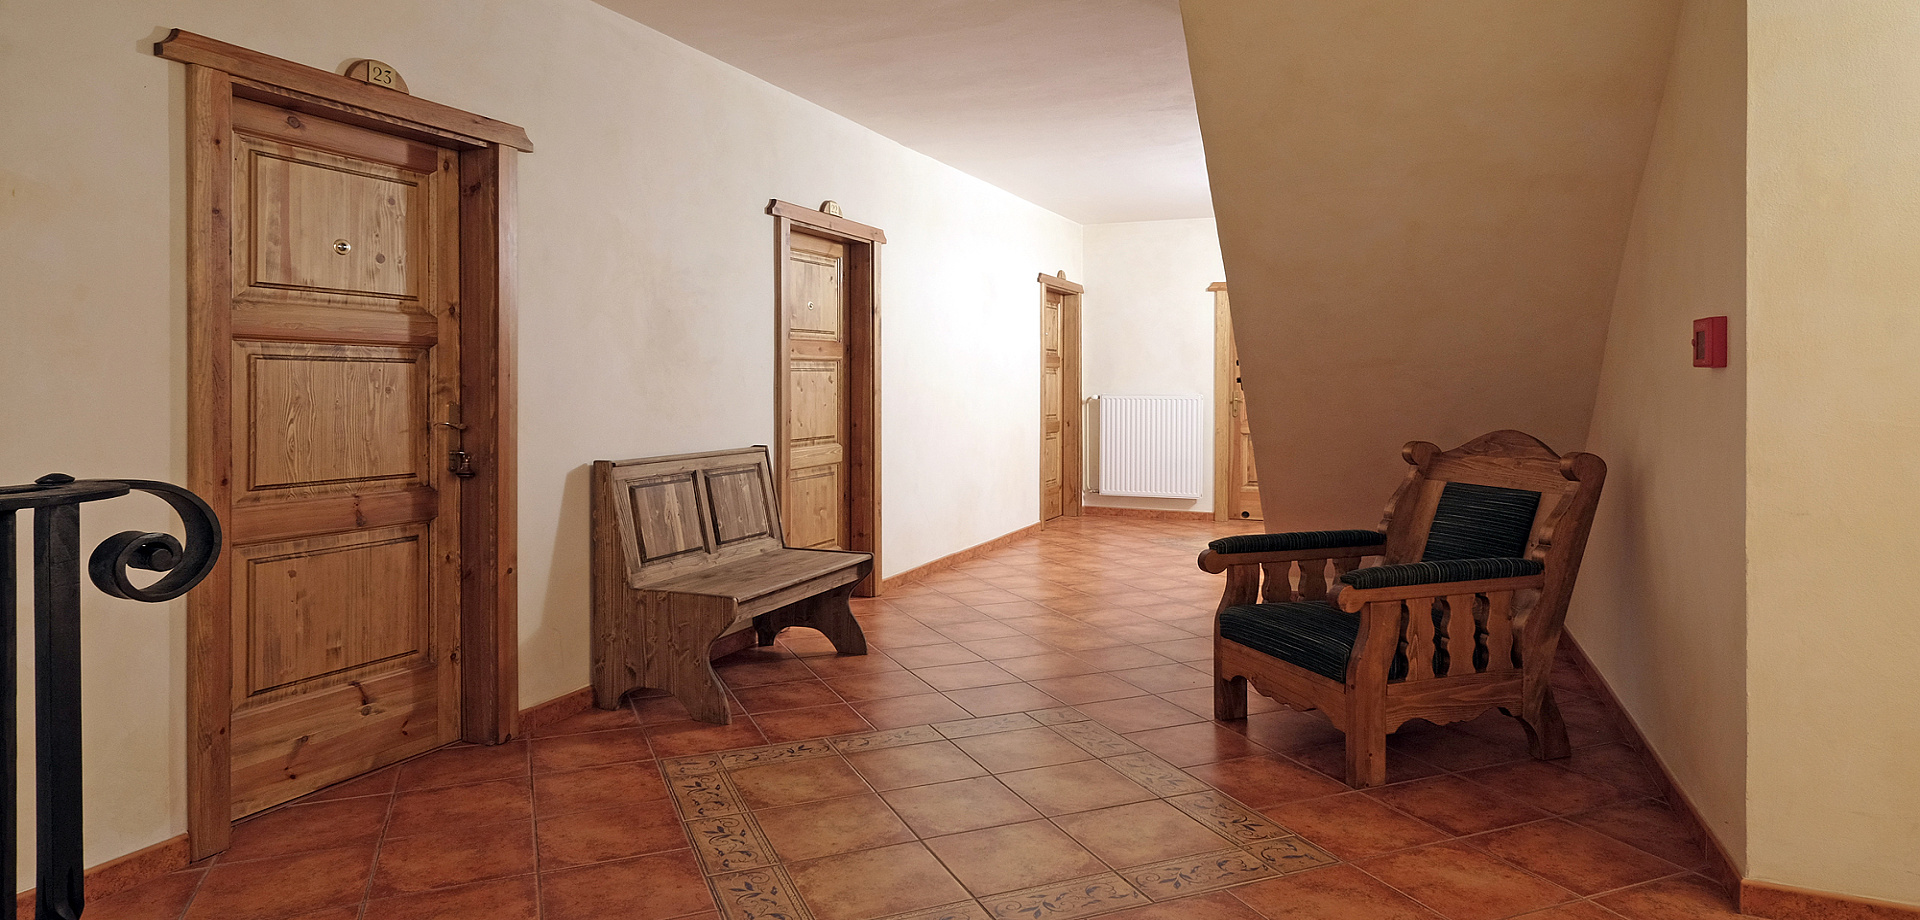 Hôtel Opat (03)